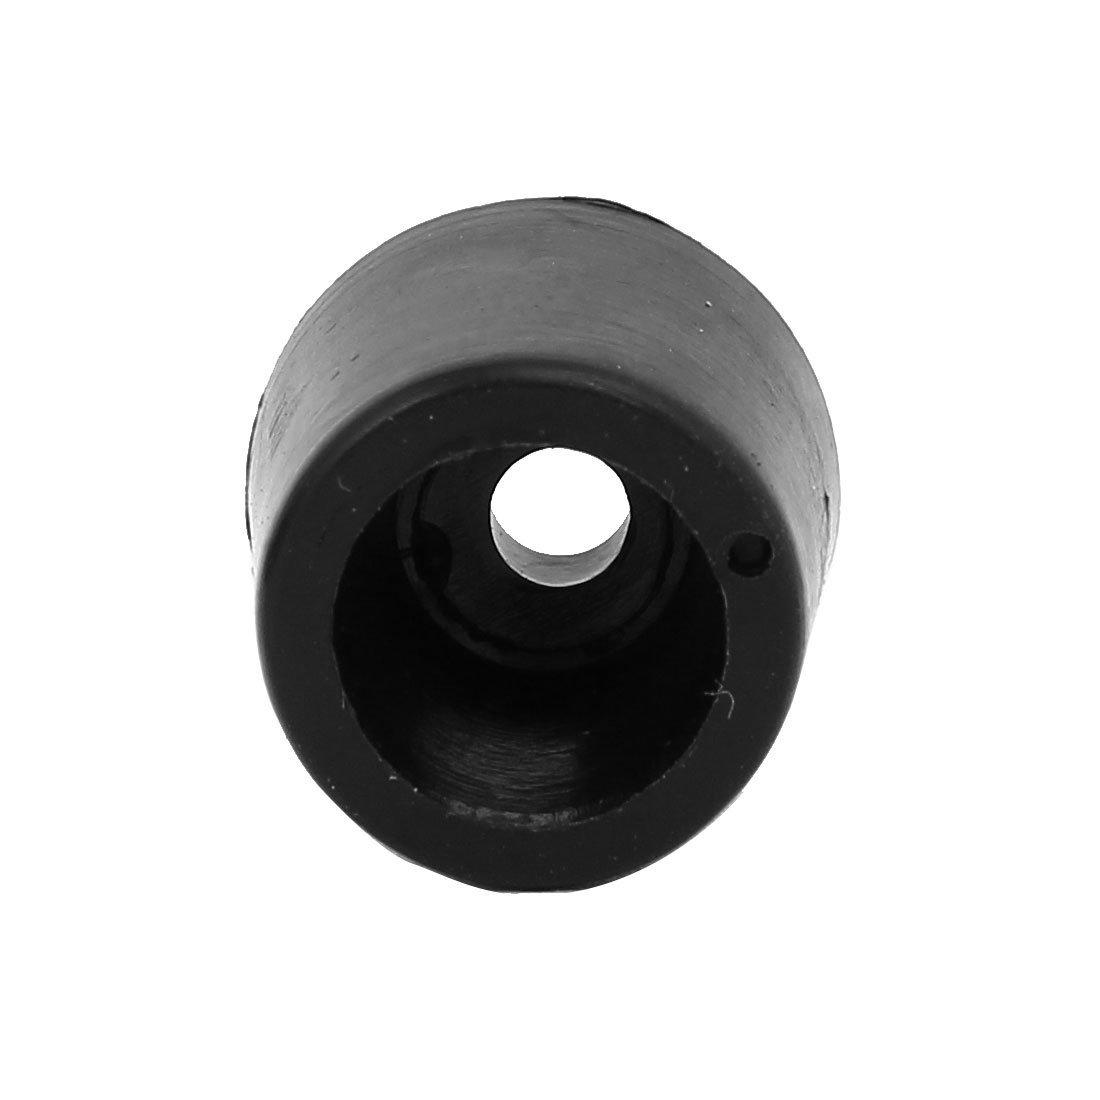 DealMux 17mmx15mm Rubber Conical Non-Slip Cover Tip Furniture Floor Pads Black 500pcs